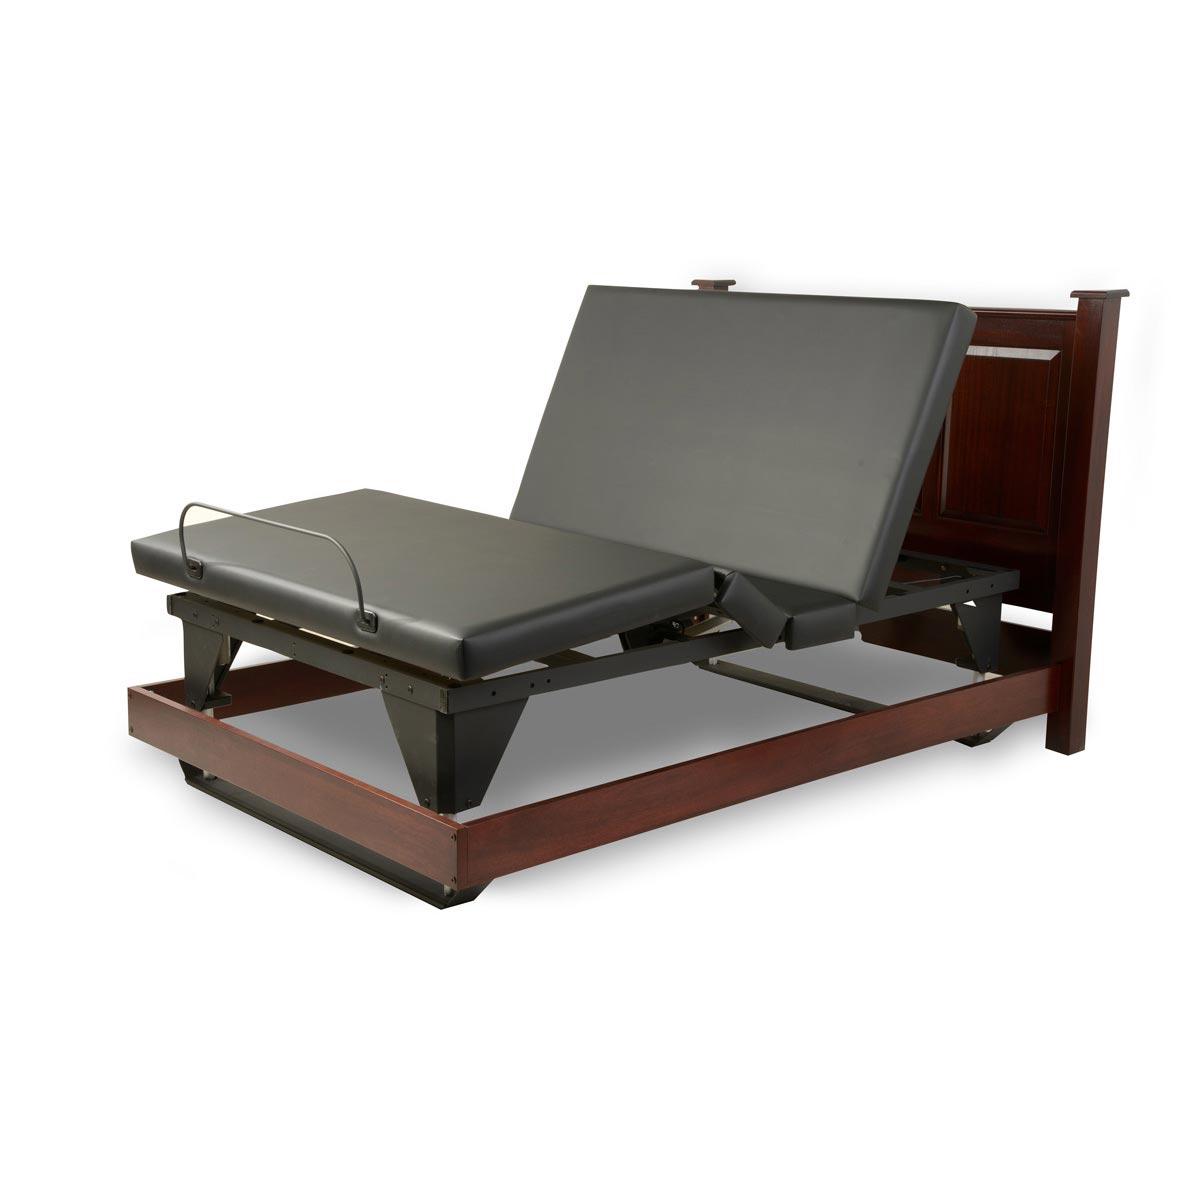 Assured Comfort Signature Series Hi-Low Bed | Medicaleshop